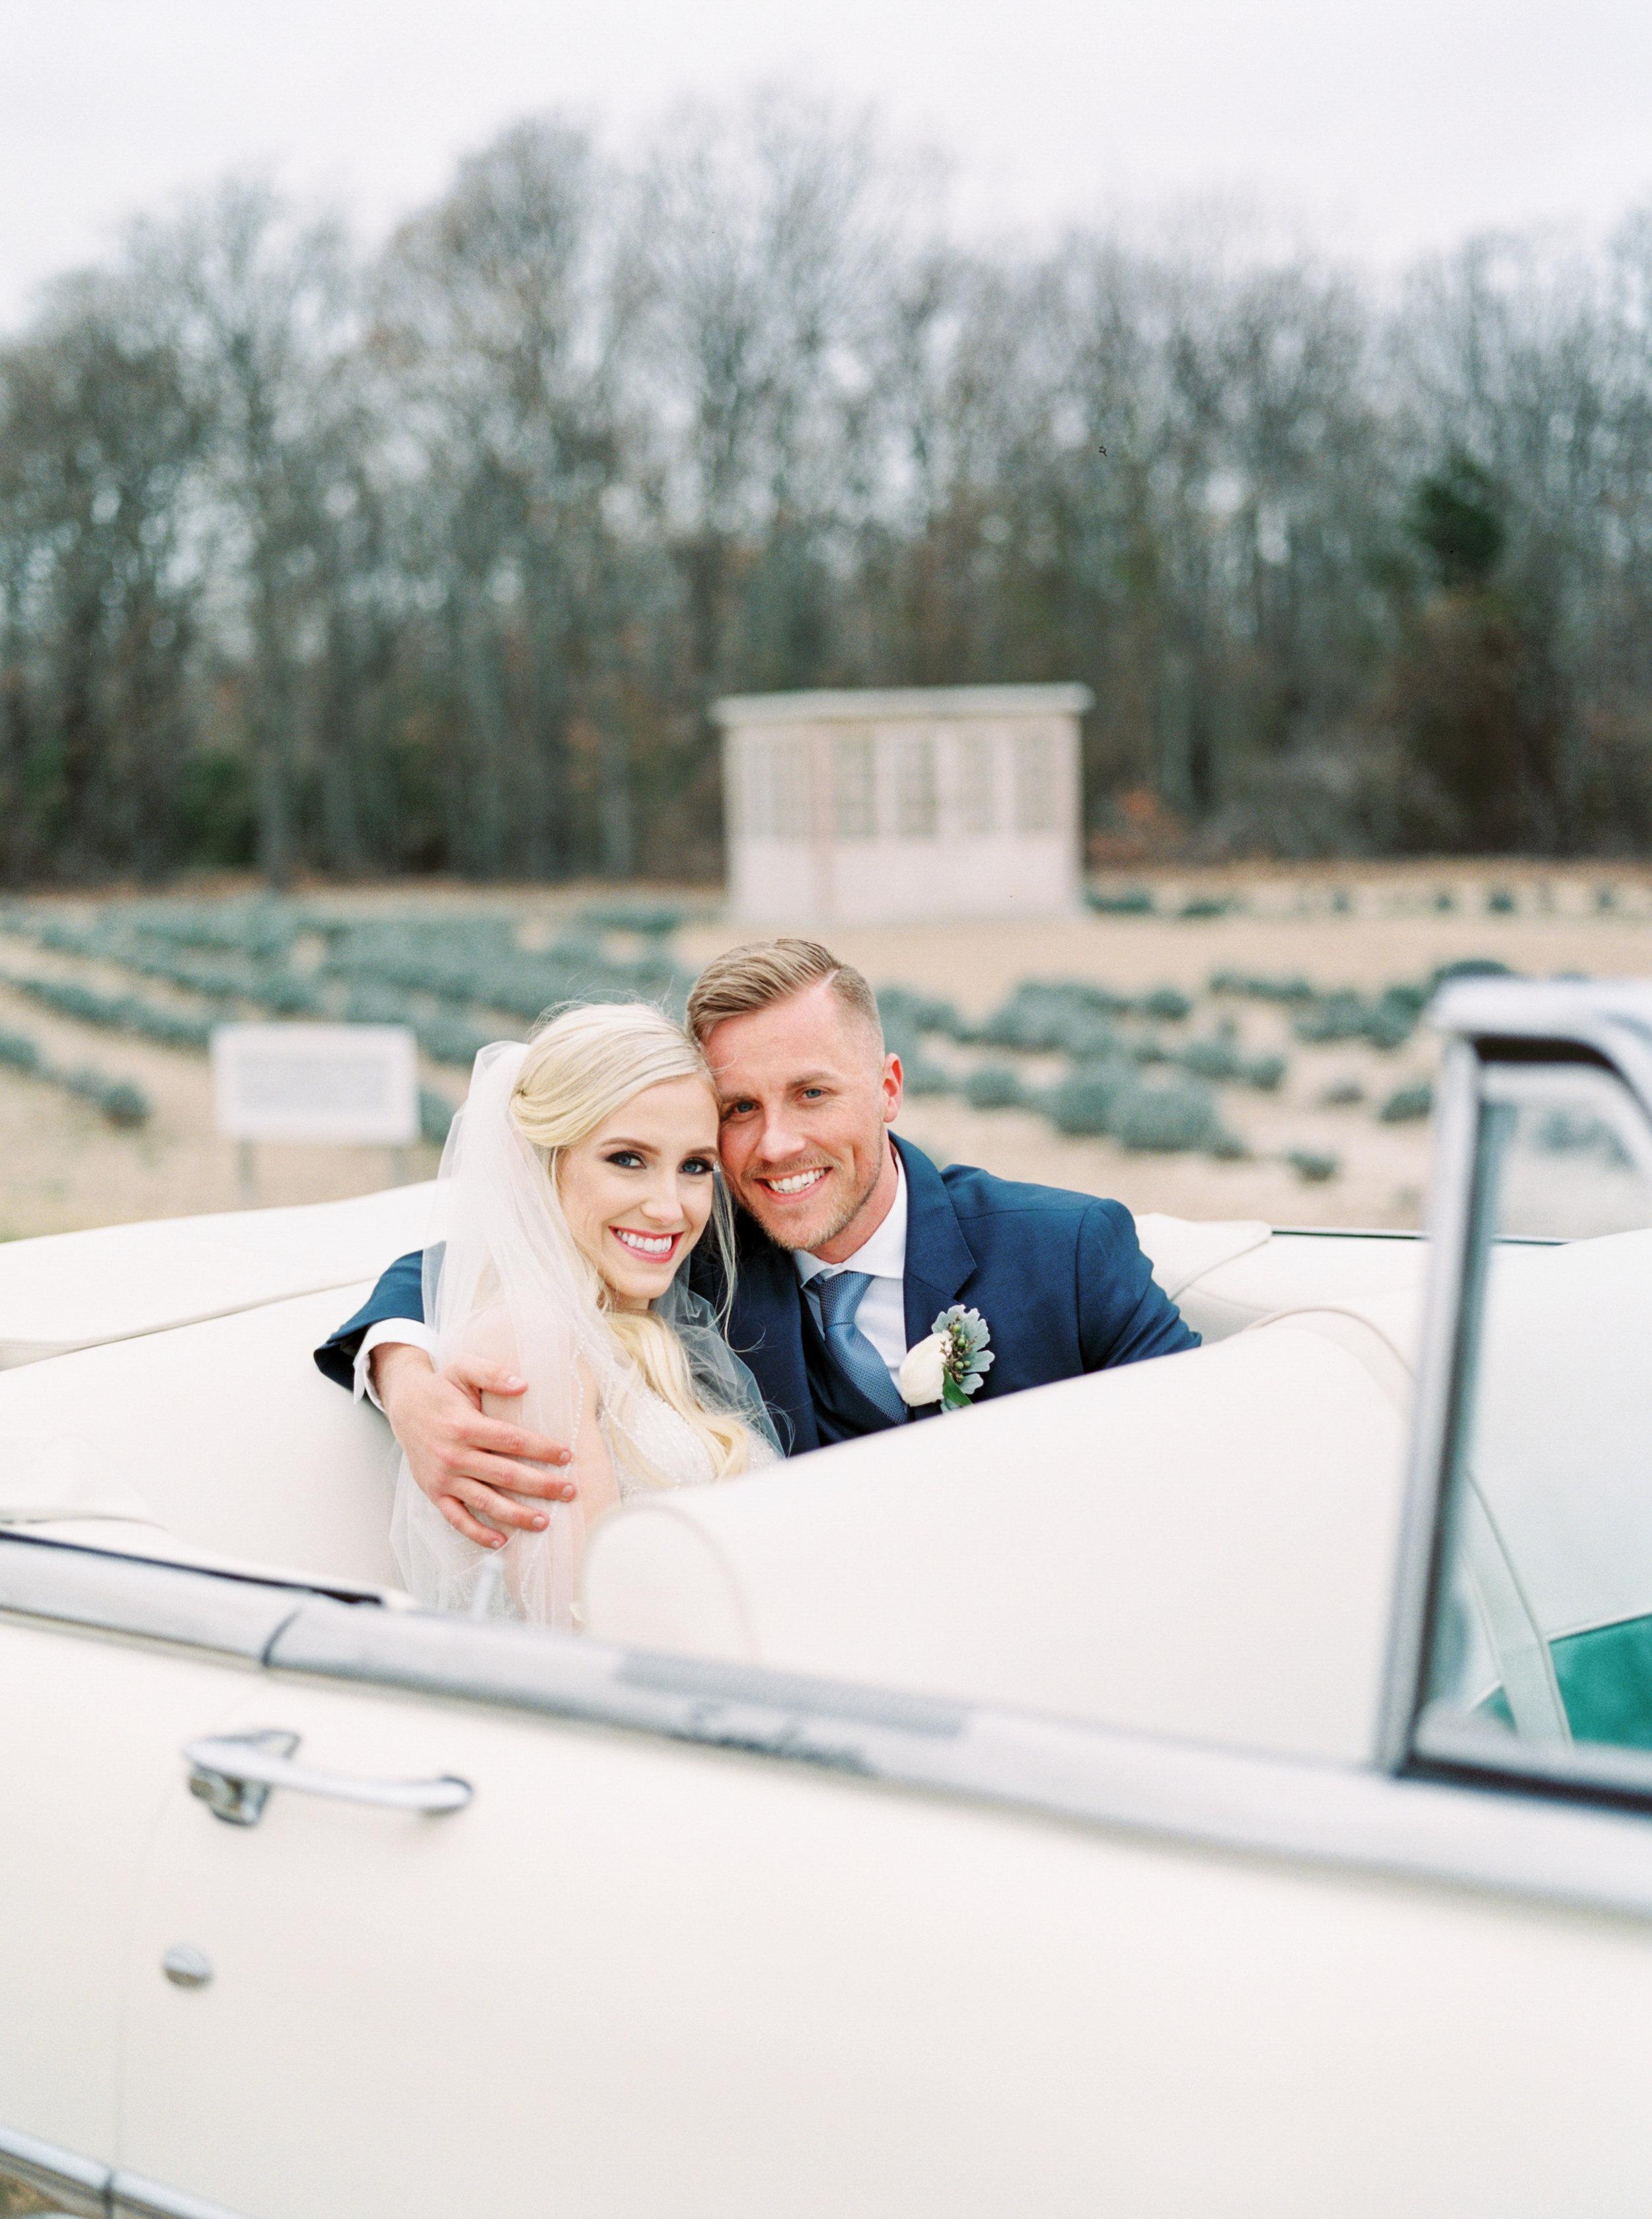 Chloe+Austin Wedding_650.JPG